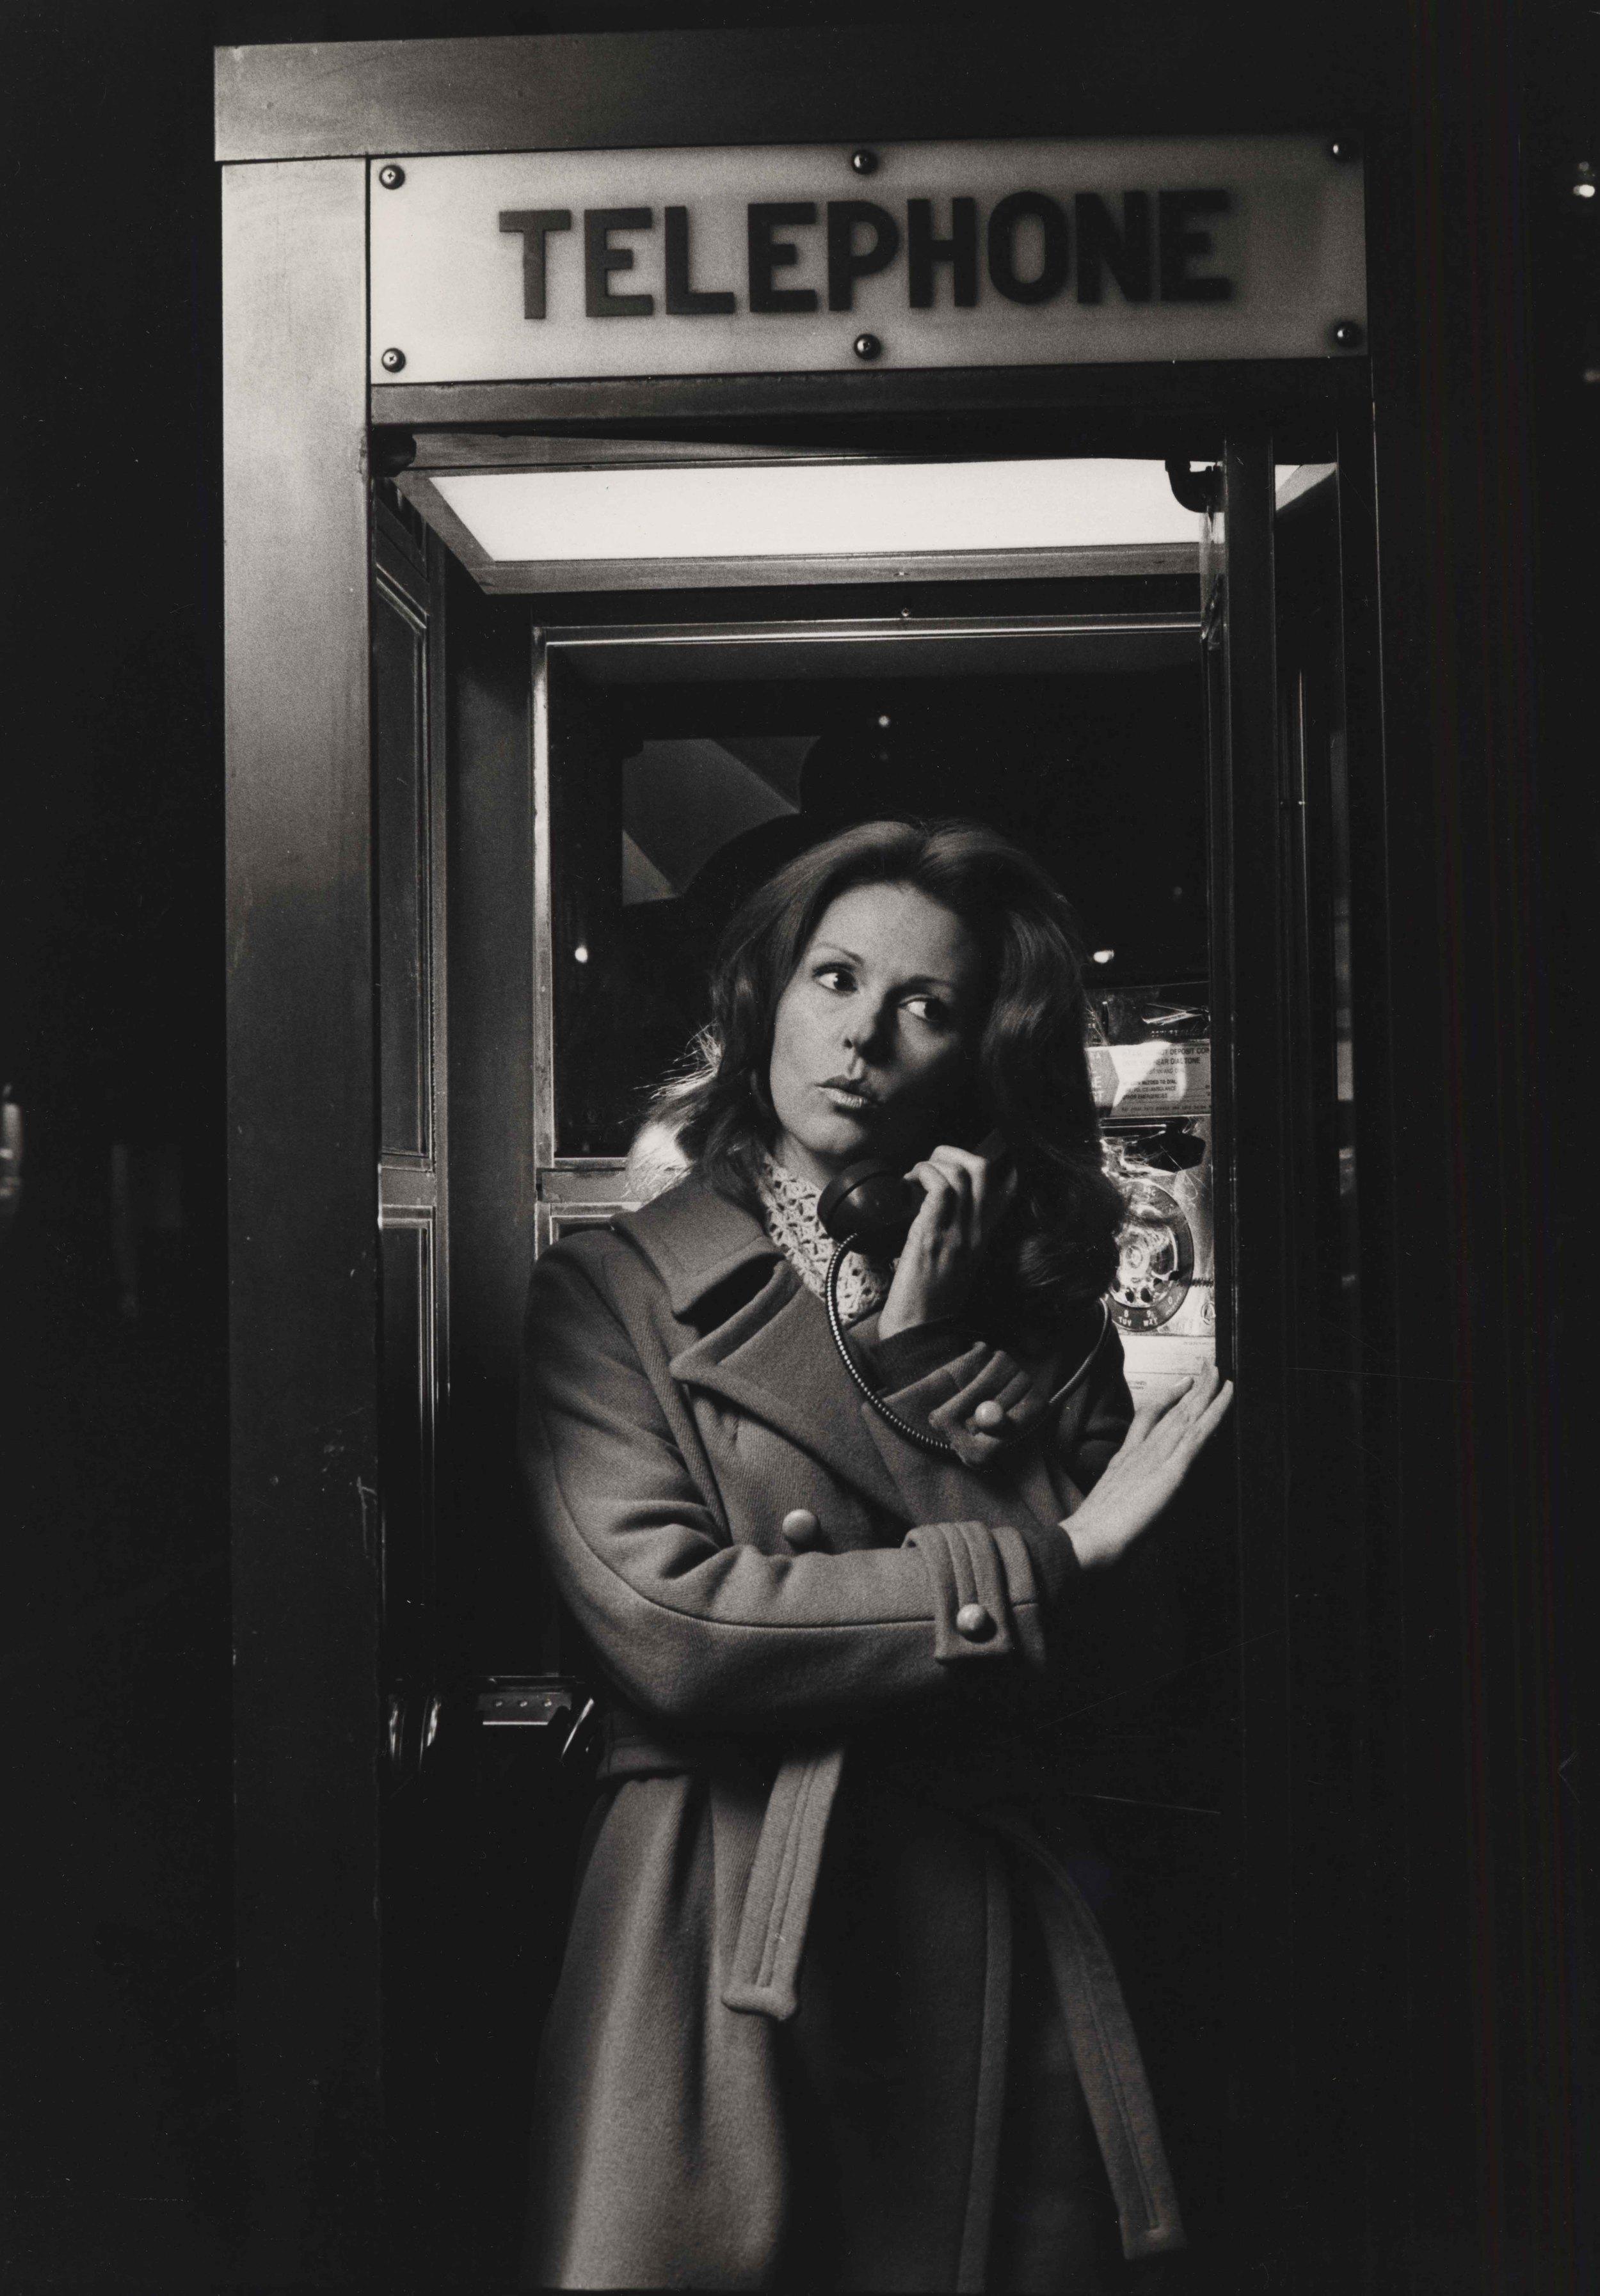 16_24_Woman in a telephone booth #2_Dan Wynn Archive.jpeg